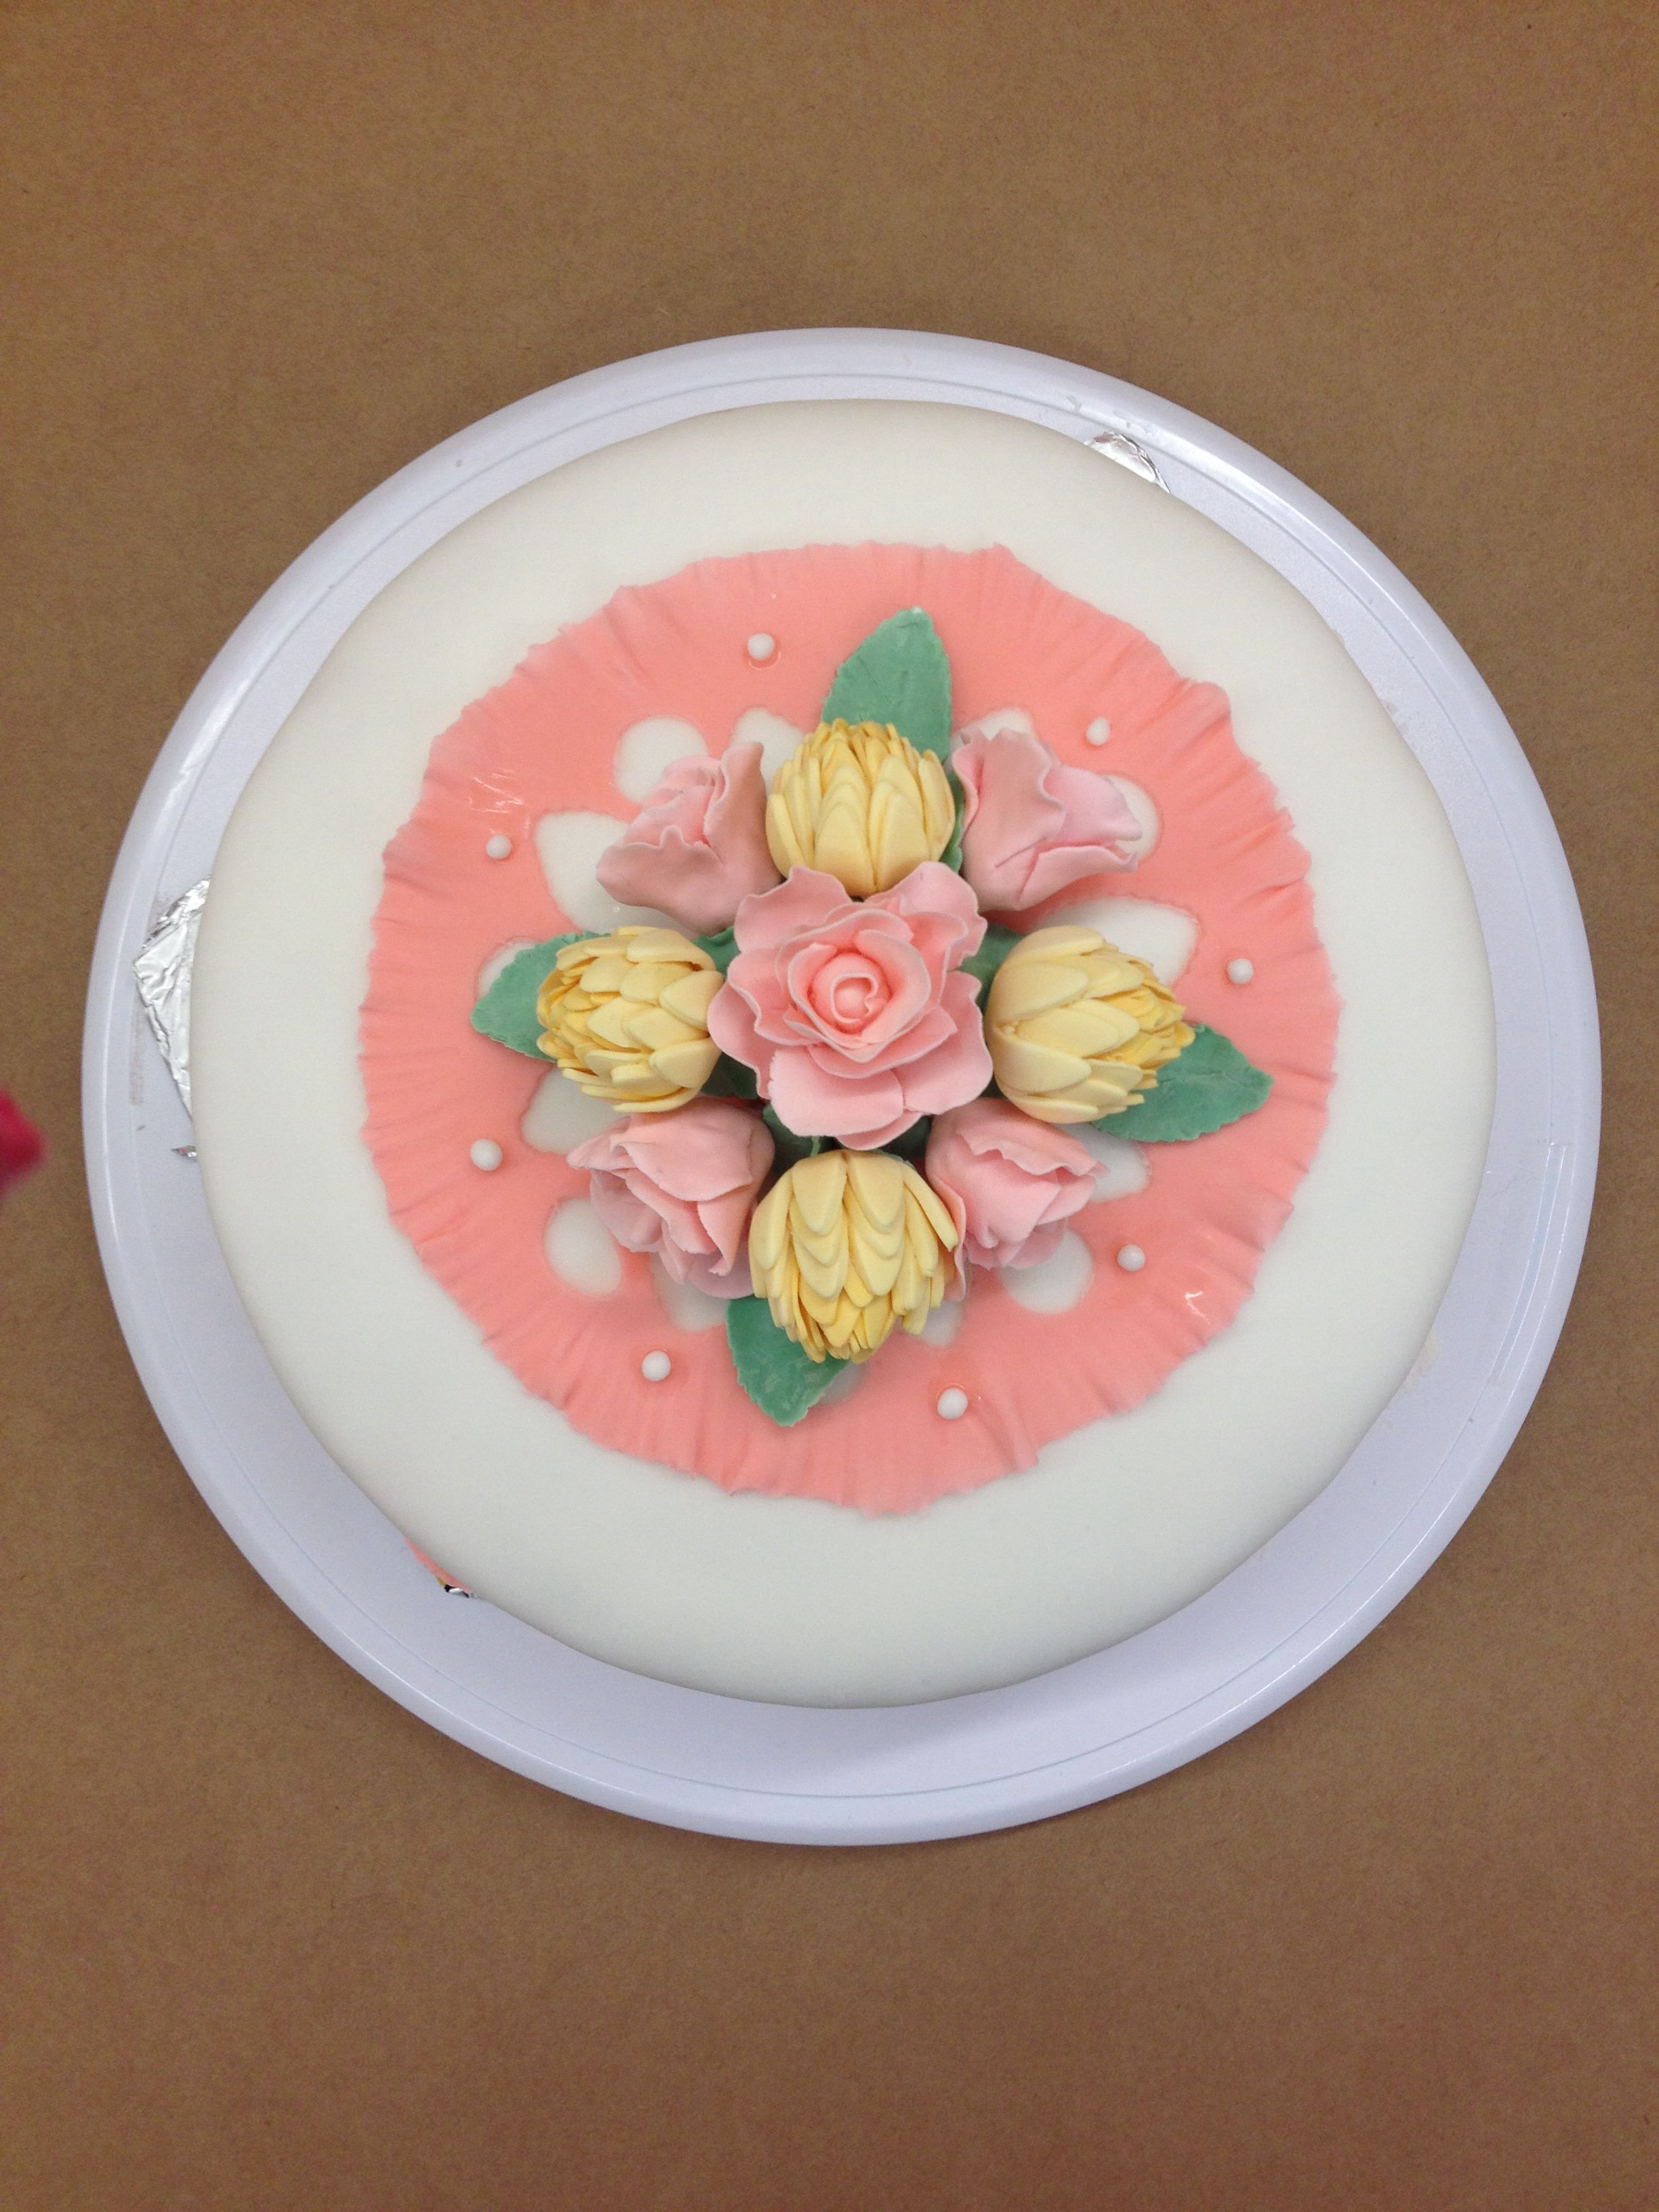 Wilton course 3 cake | Food galore | Pinterest | Cake, Cake designs ...